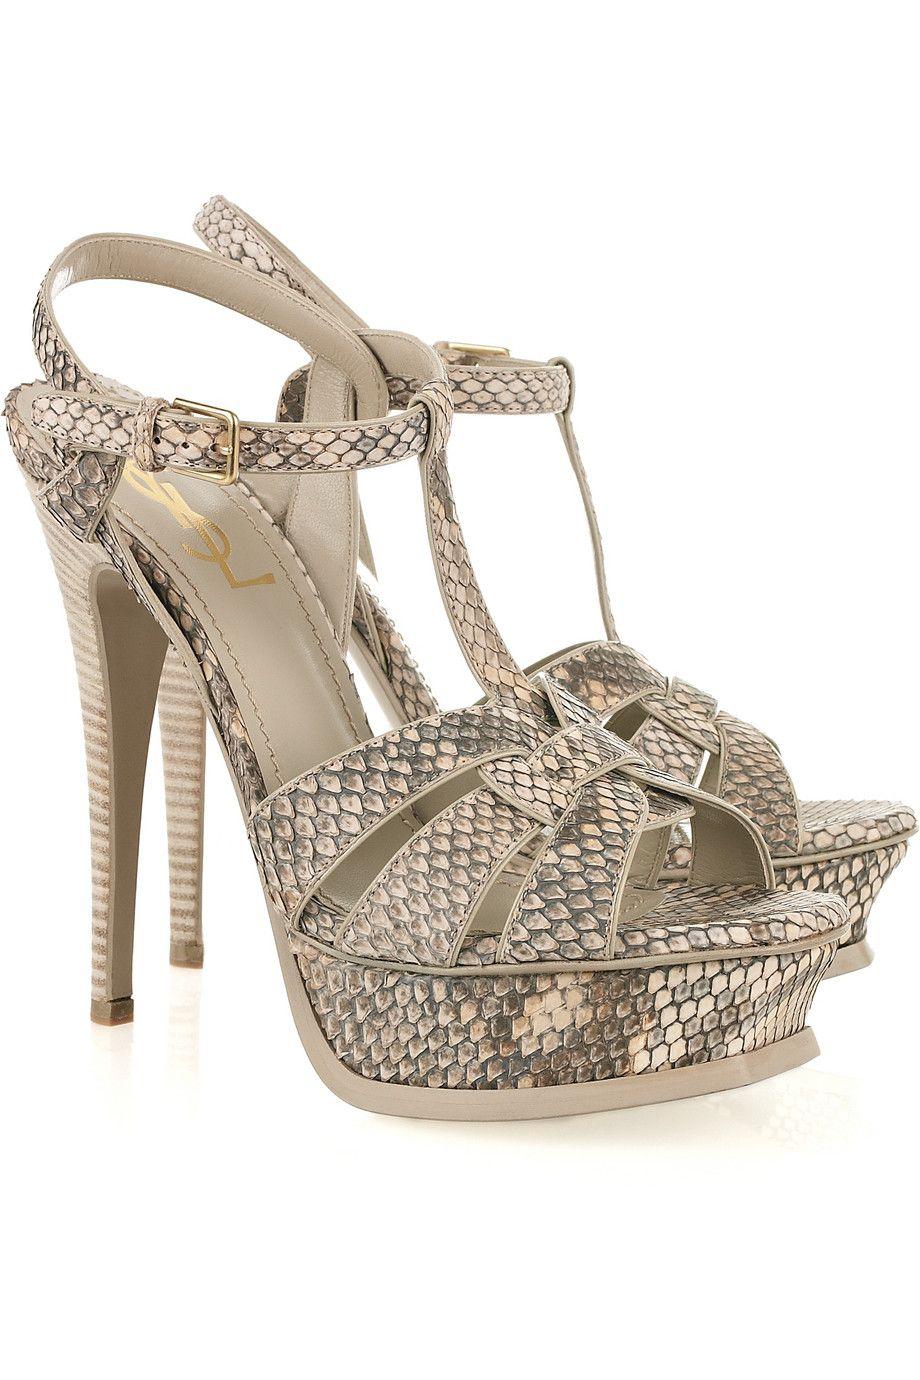 f7b5bf519a0 YSL Tribute python sandals - i dieee!!!